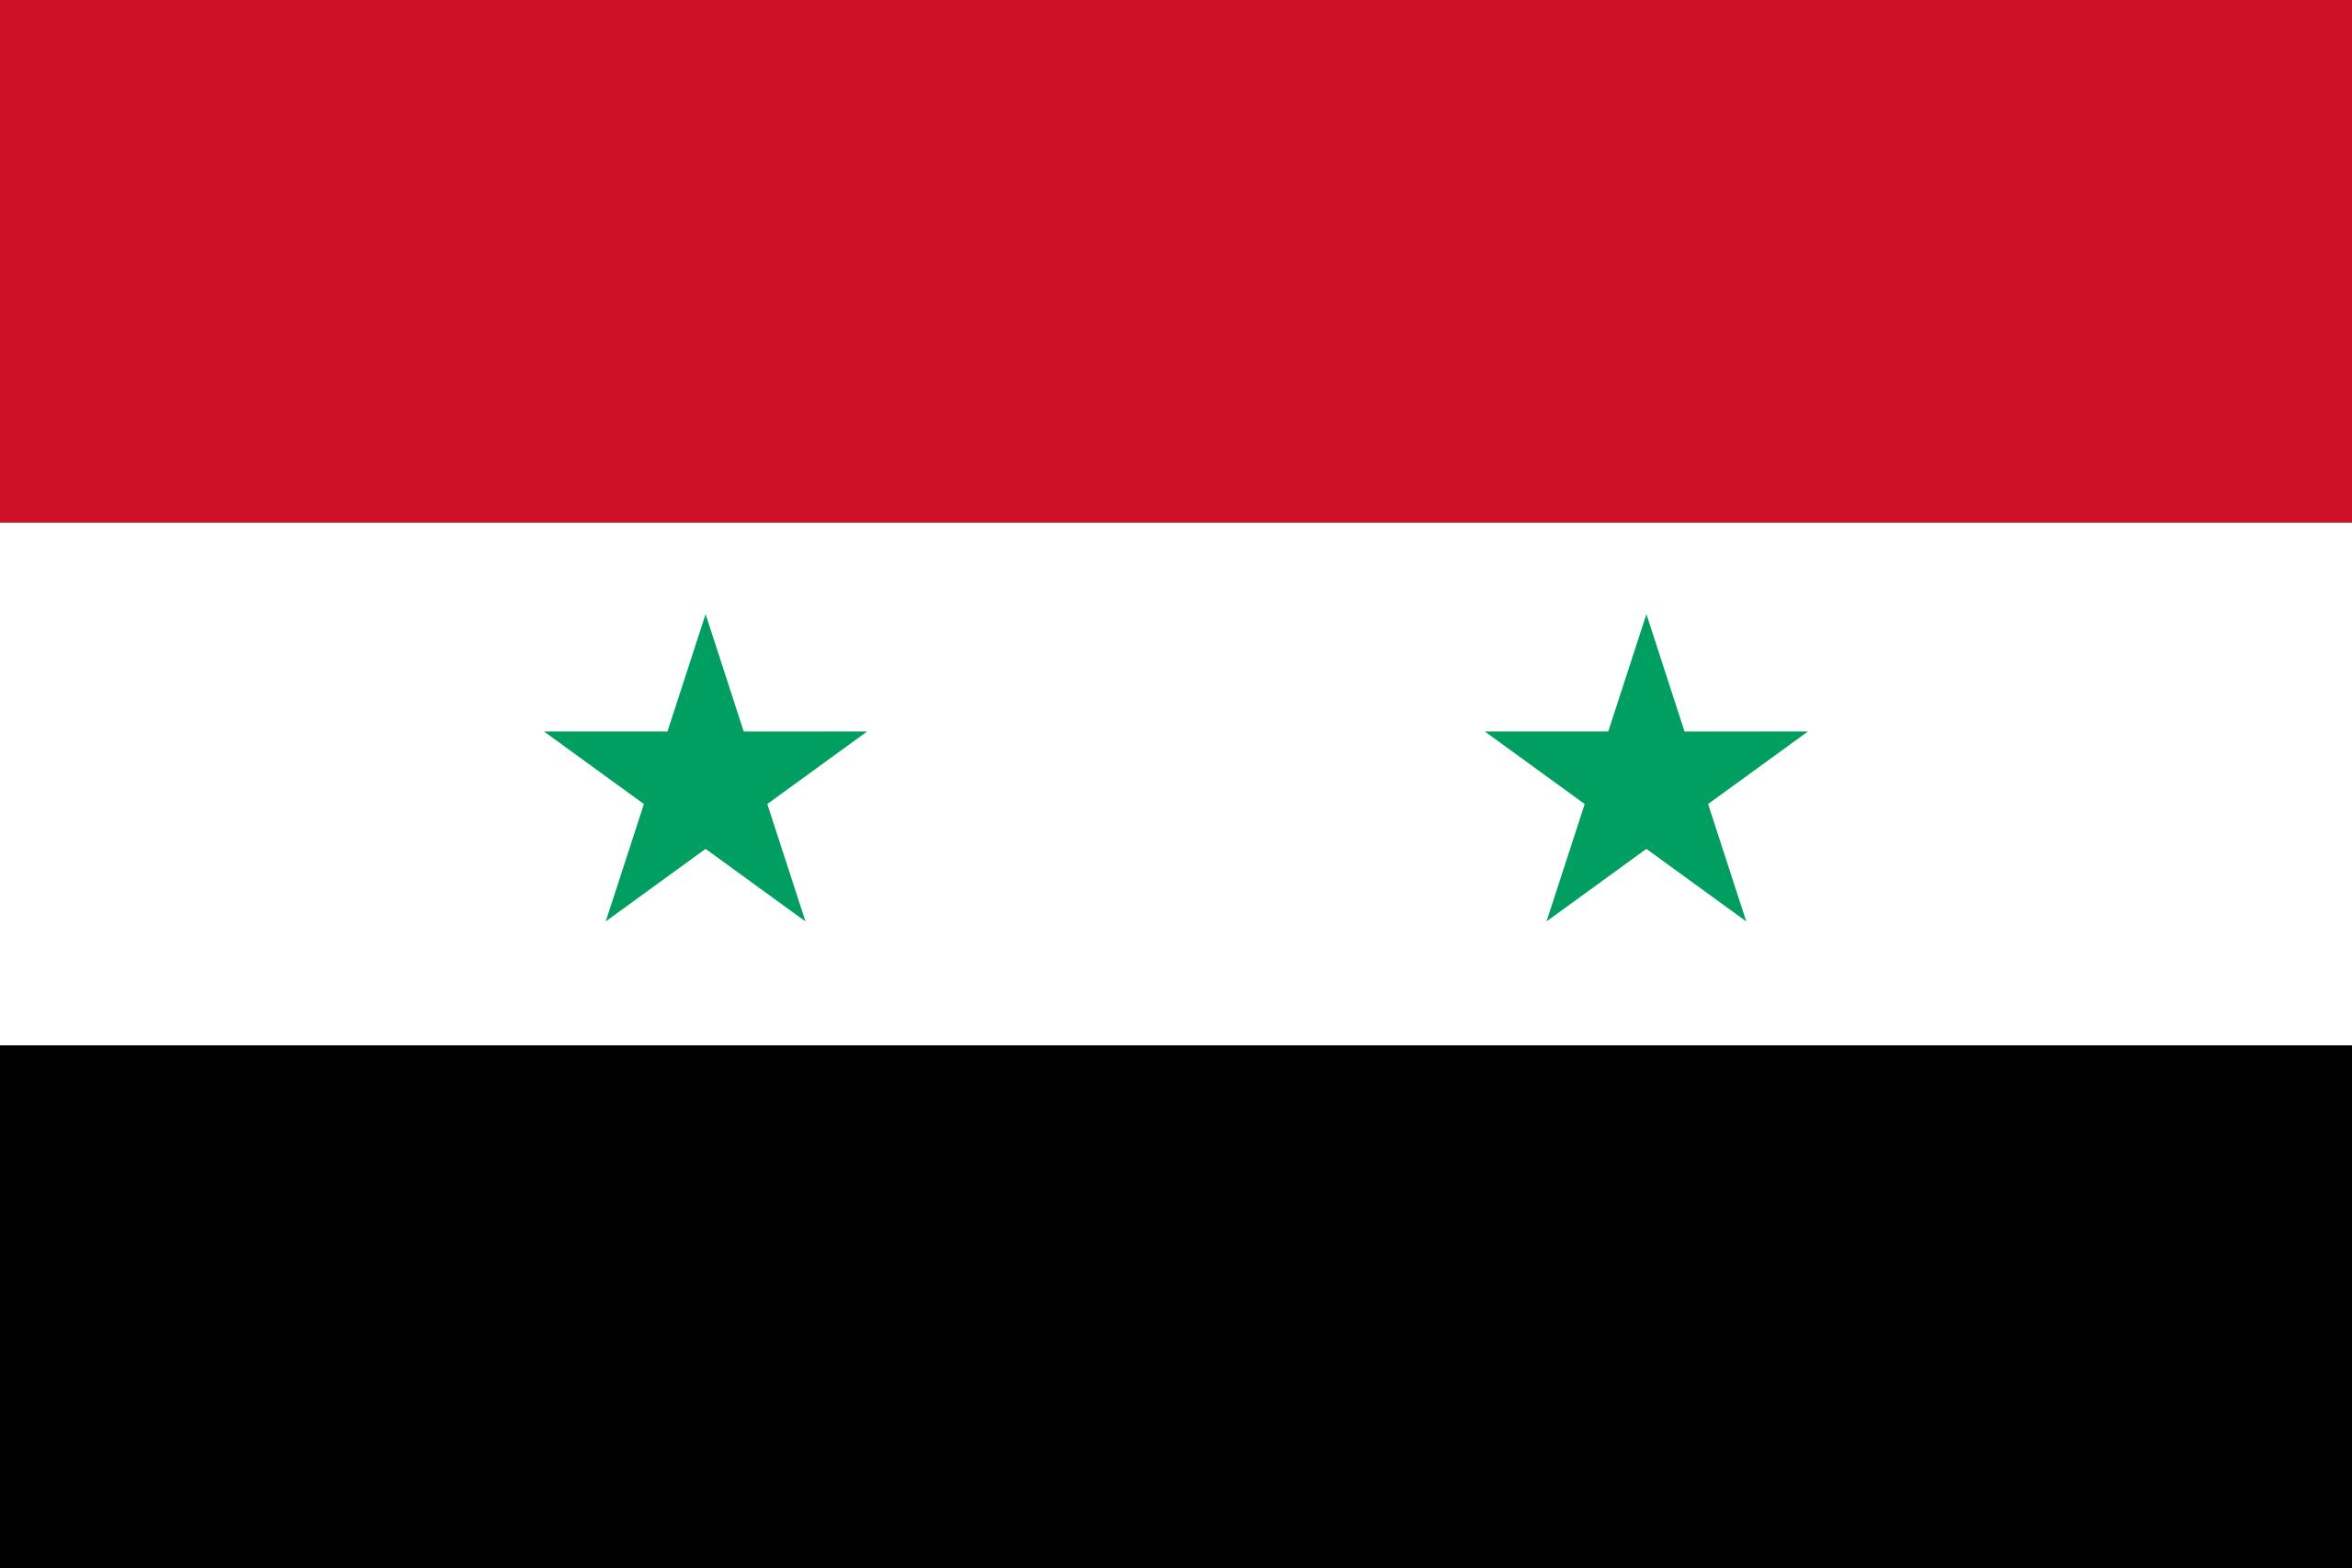 siria, देश, emblema, लोग�प्रतीकbolo - HD वॉलपेपर - प्रोफेसर-falken.com